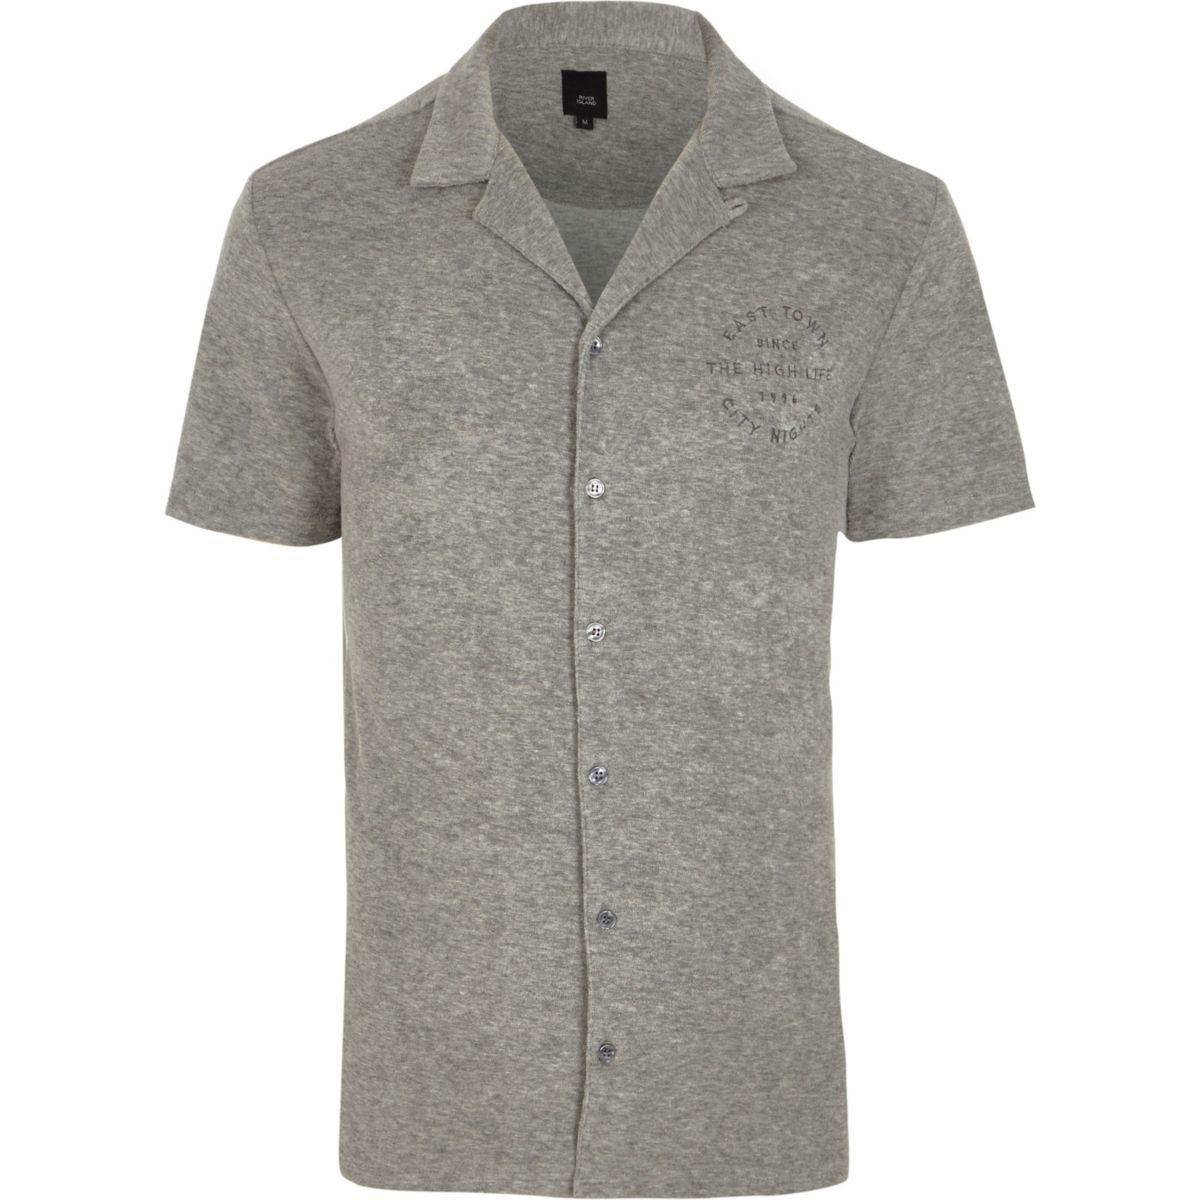 graues slim fit hemd mit print hemden sale herren. Black Bedroom Furniture Sets. Home Design Ideas